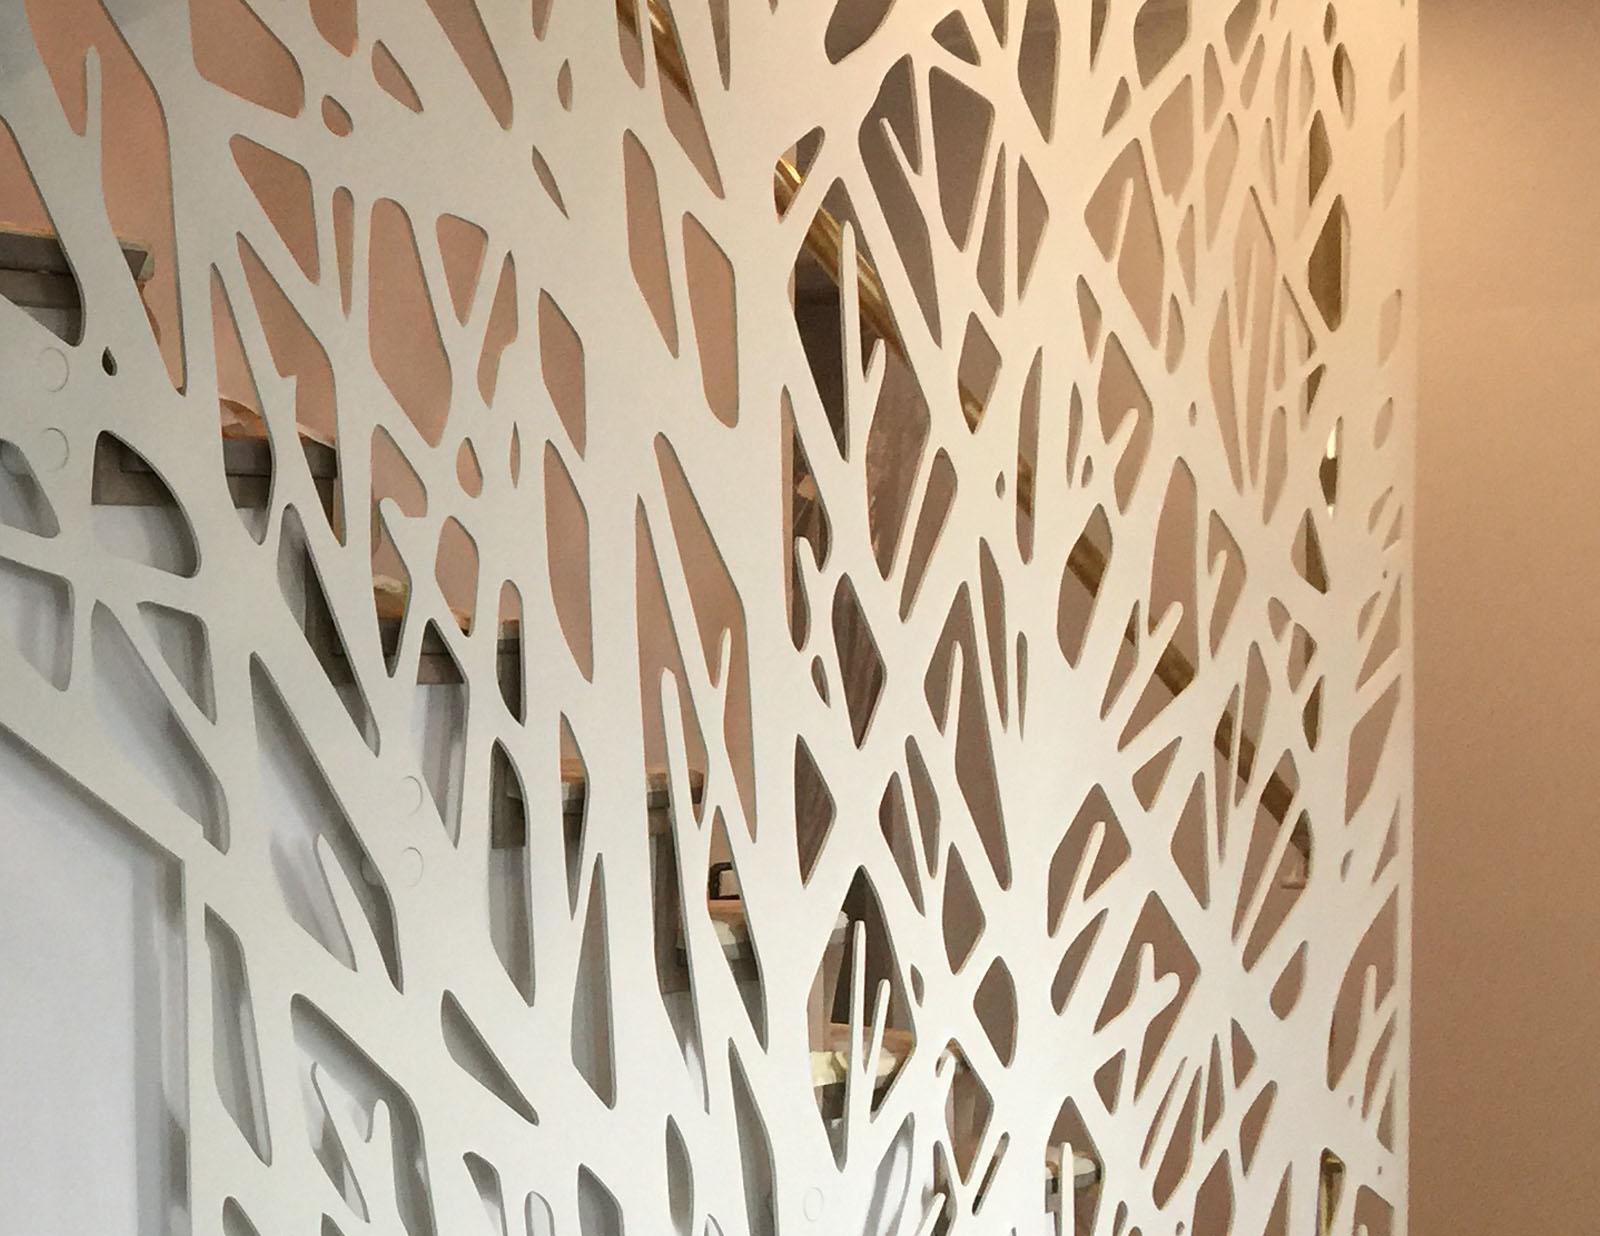 Separator scara interioara debitat laser metal haute couture